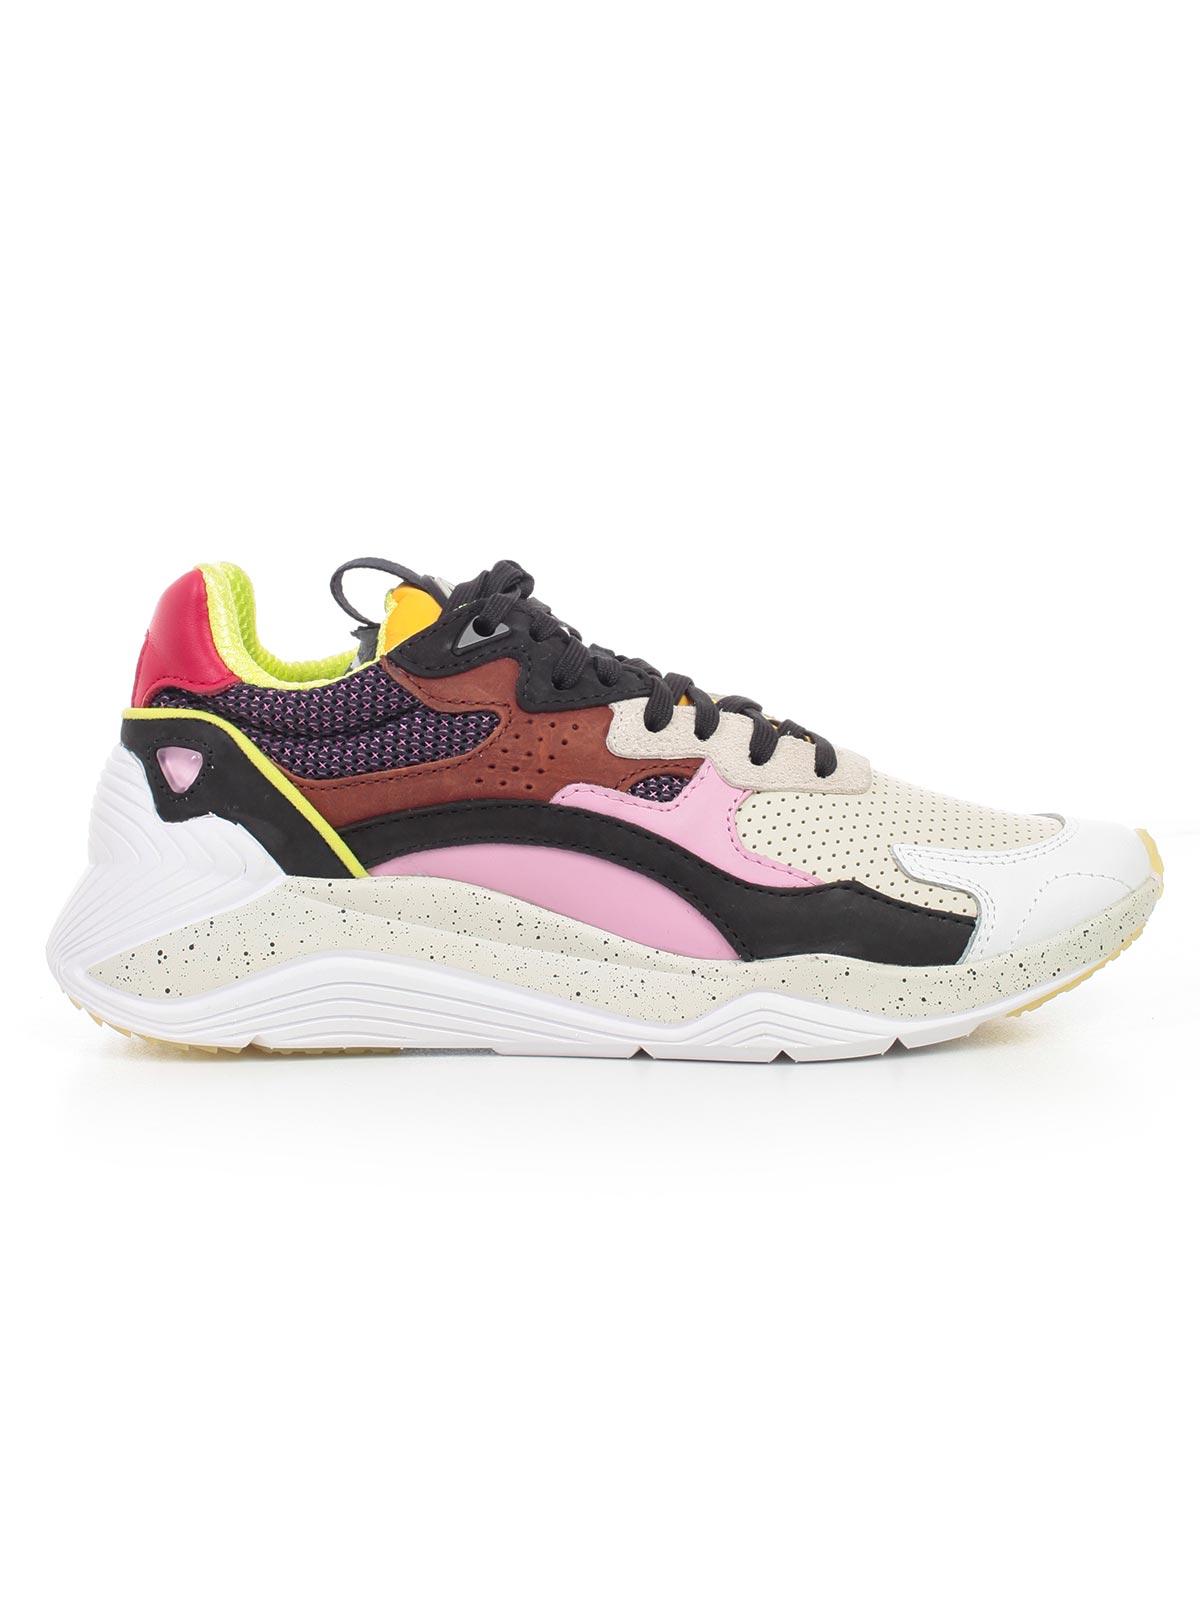 Mcq Alexander Mcqueen Shoes